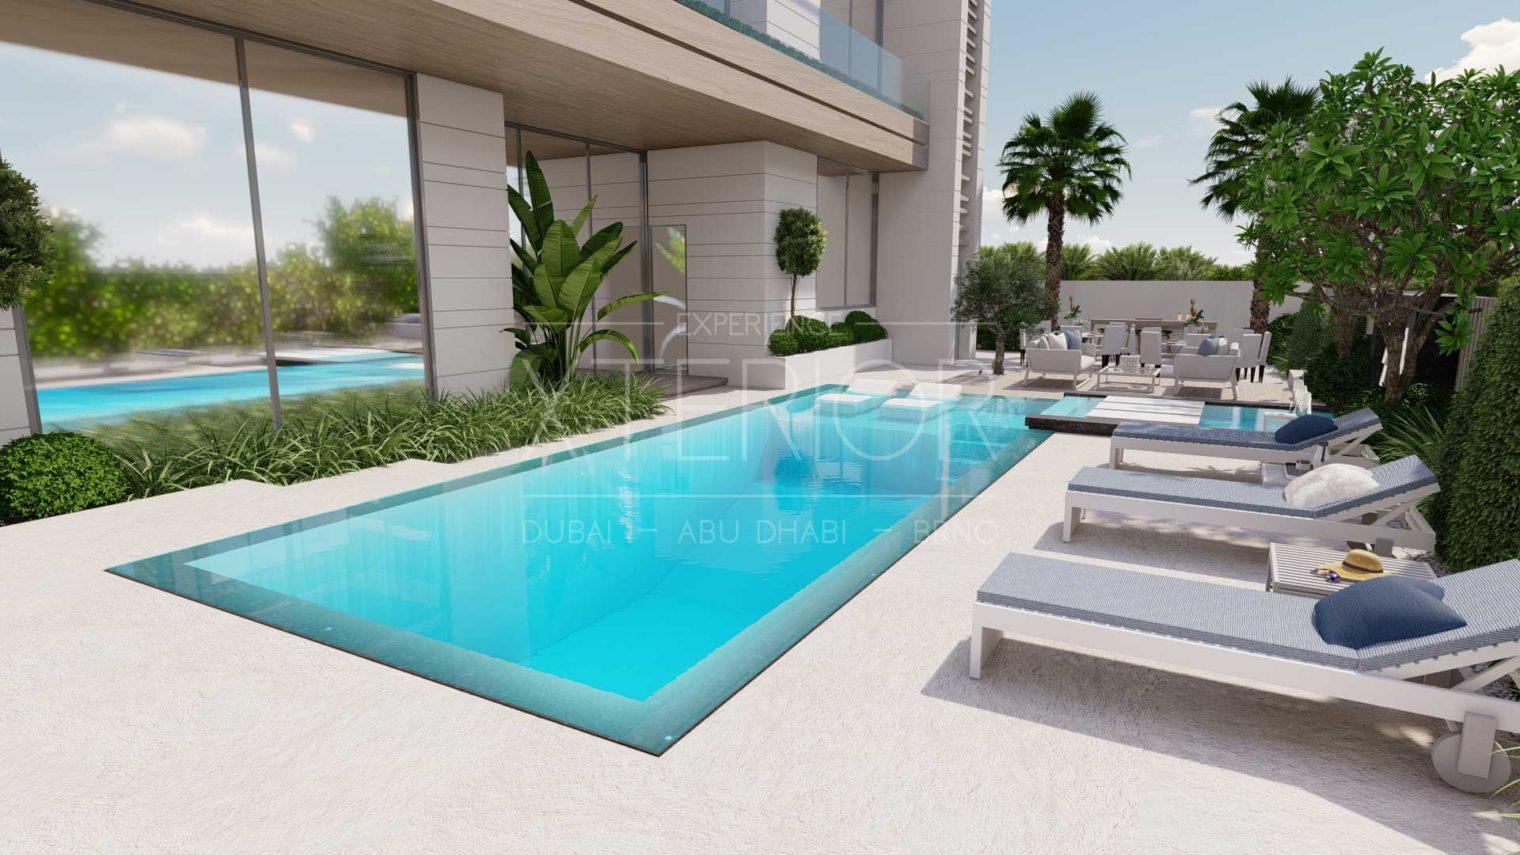 Pool Construction Company